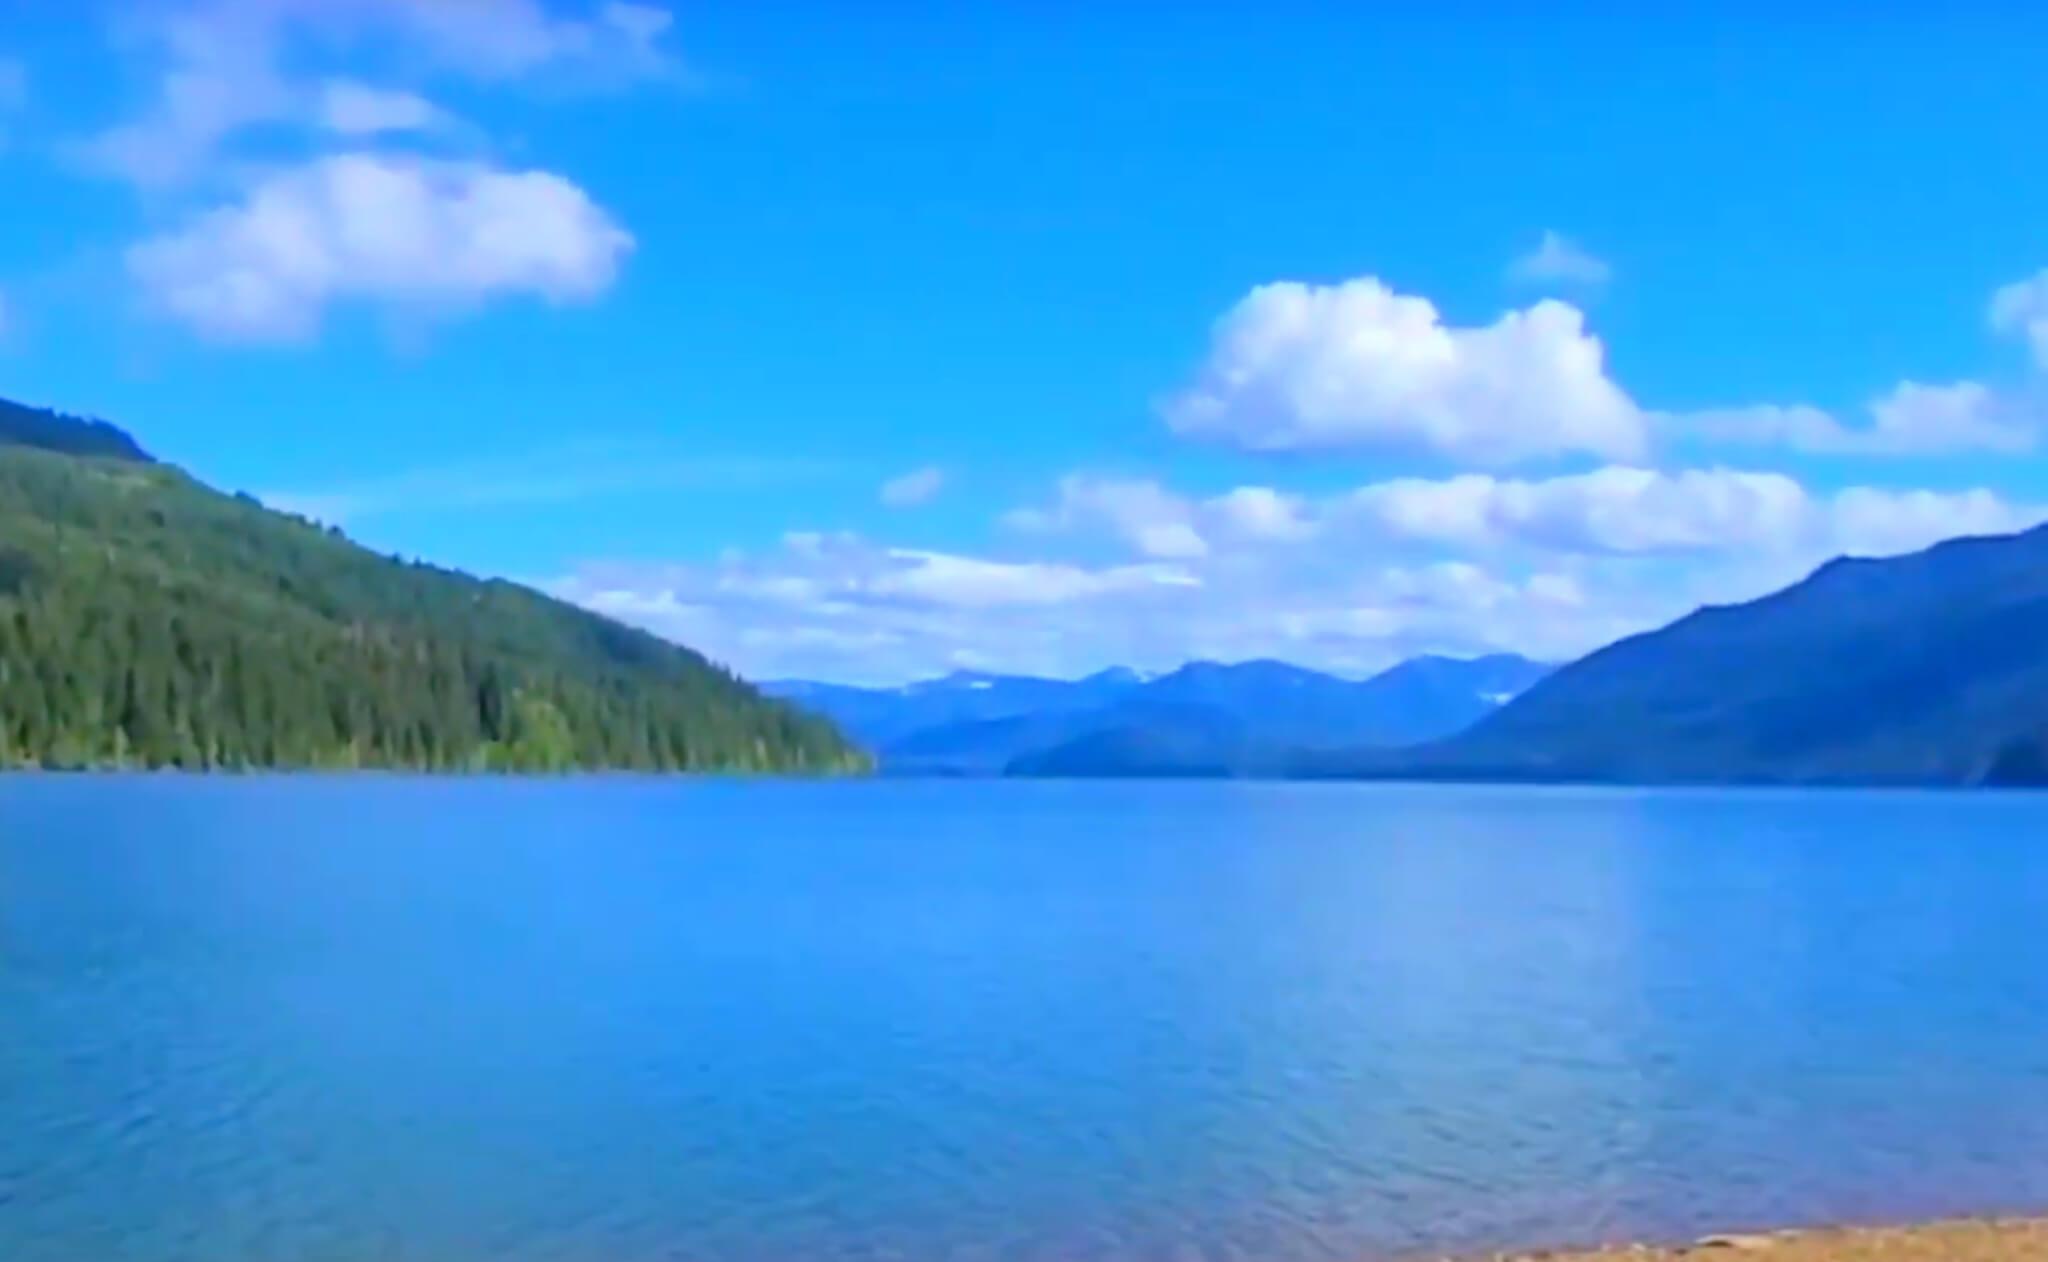 Kachess-Lake-Fishing-Report-Guide-Washington-WA-07